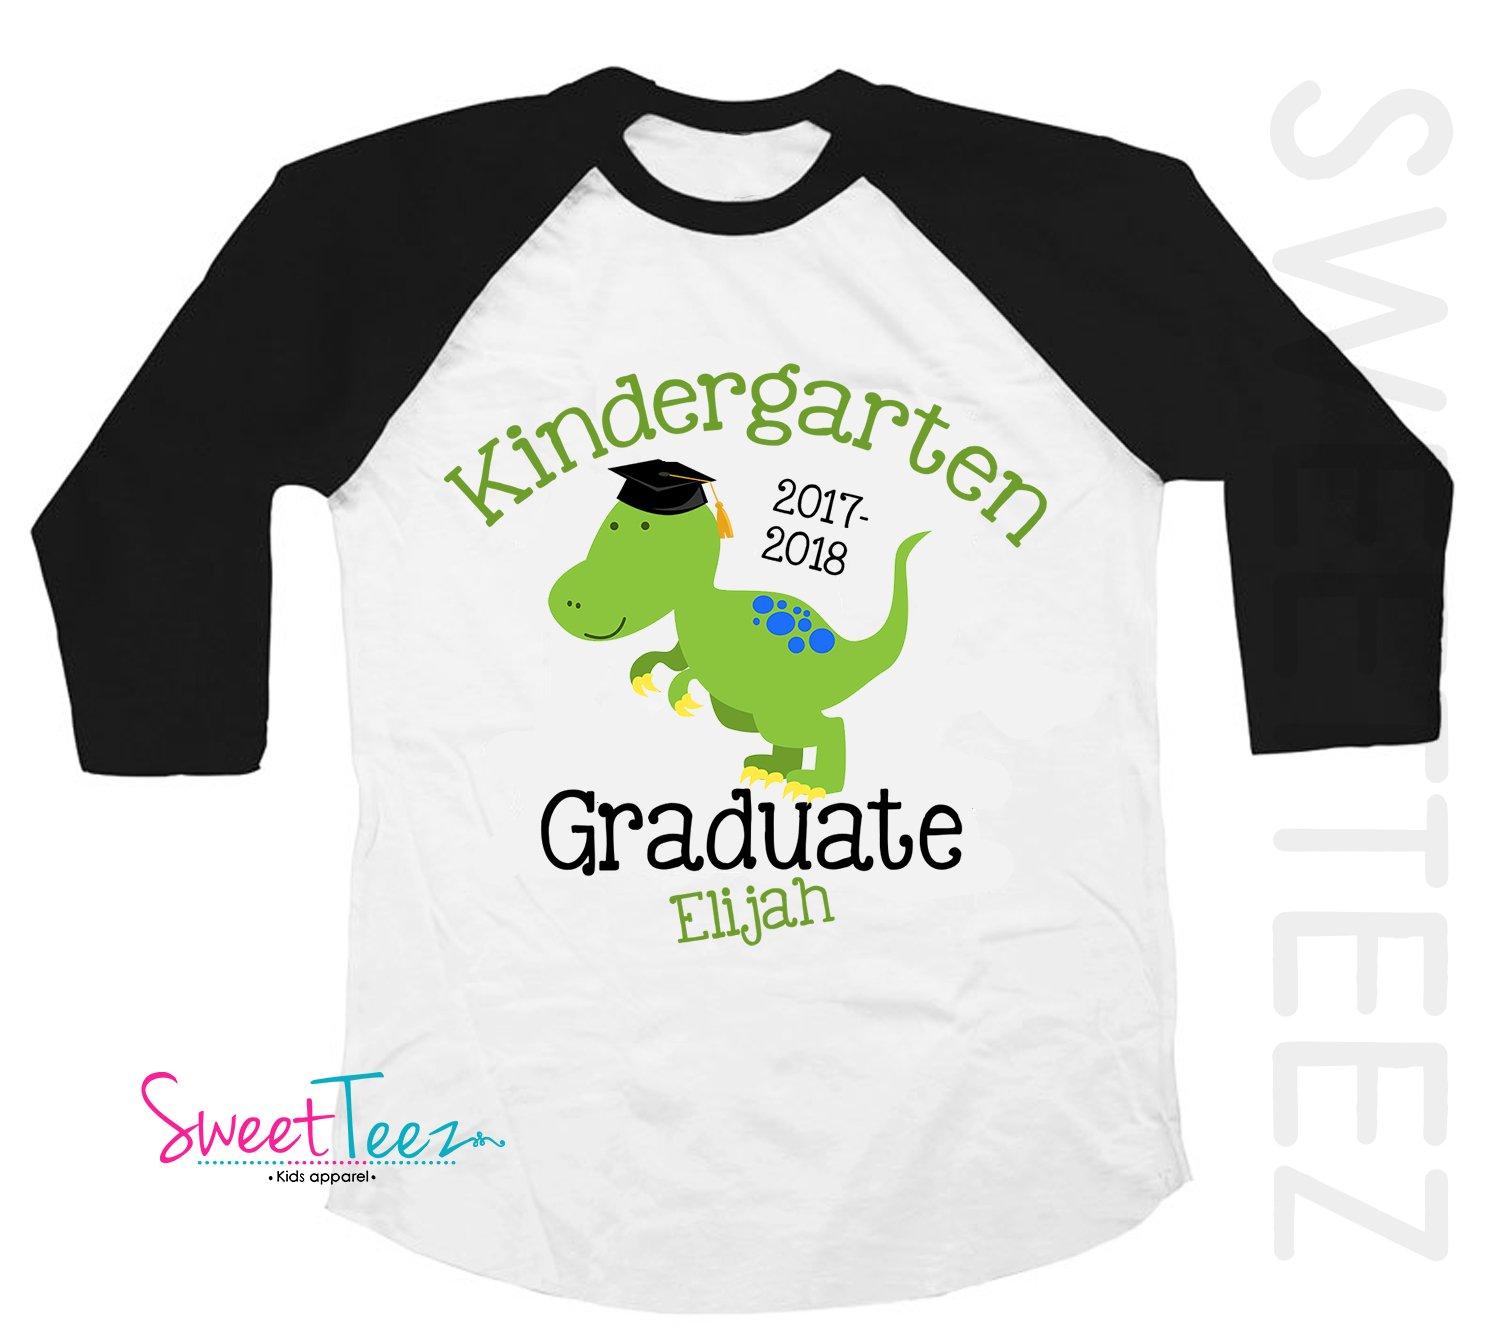 Kindergarten Graduation Shirt, Personalized Kindergarten Graduation Shirt, Dinosaur Shirt For Boys , Graduation Gift, Black Shirt